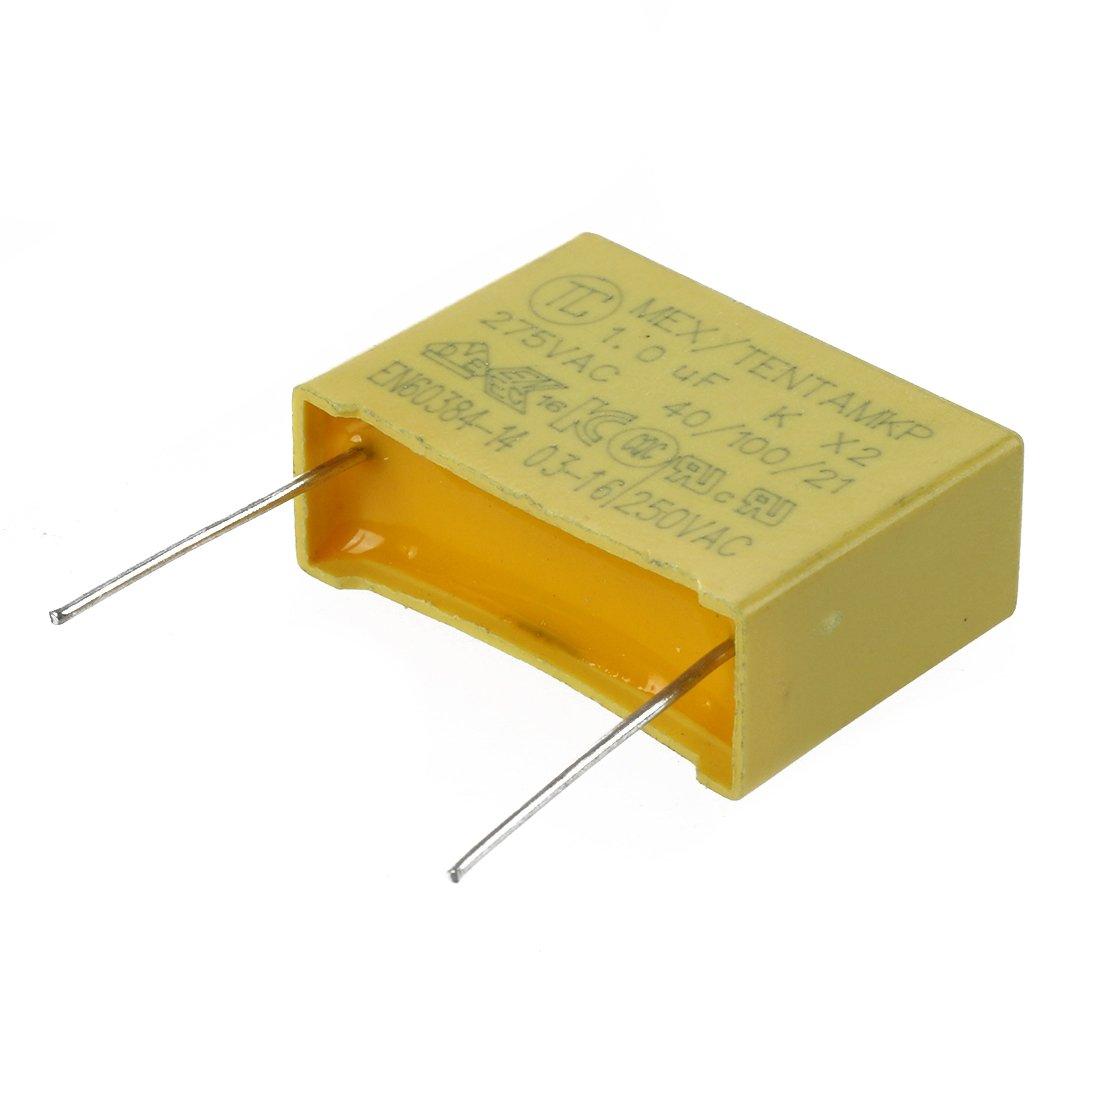 SODIAL(R) 10 Pcs AC 275V 1uF Polypropylene Film Safety Capacitors